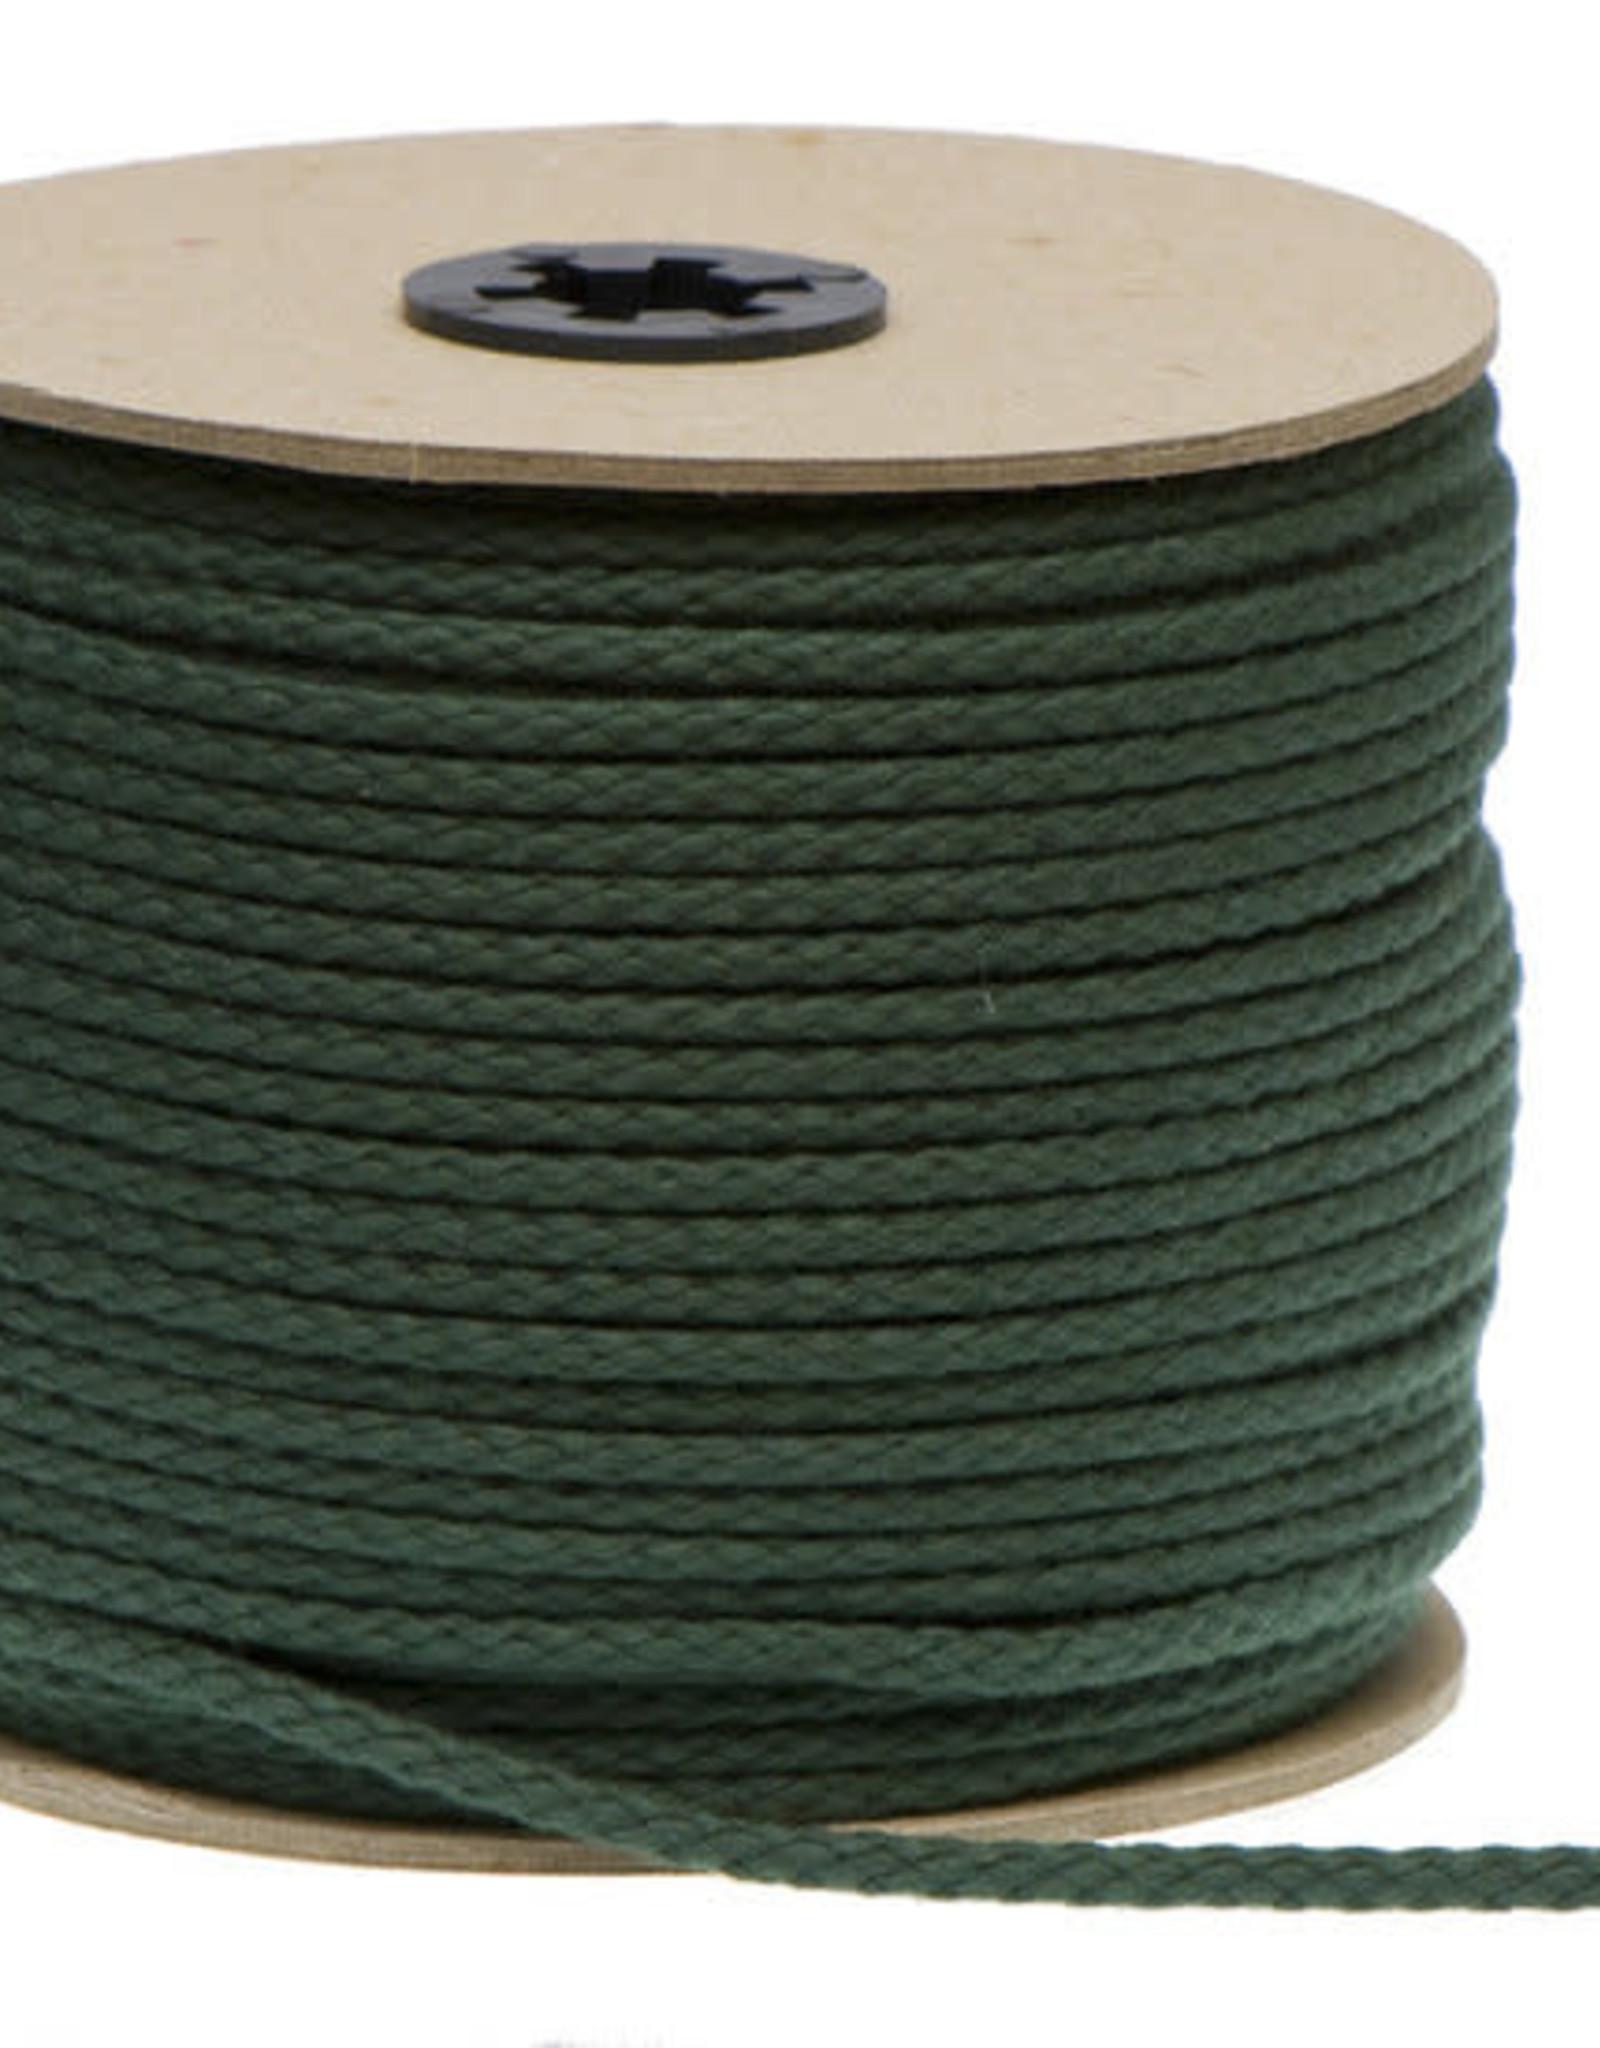 Katoenen Koord Donkergroen  - 5mm